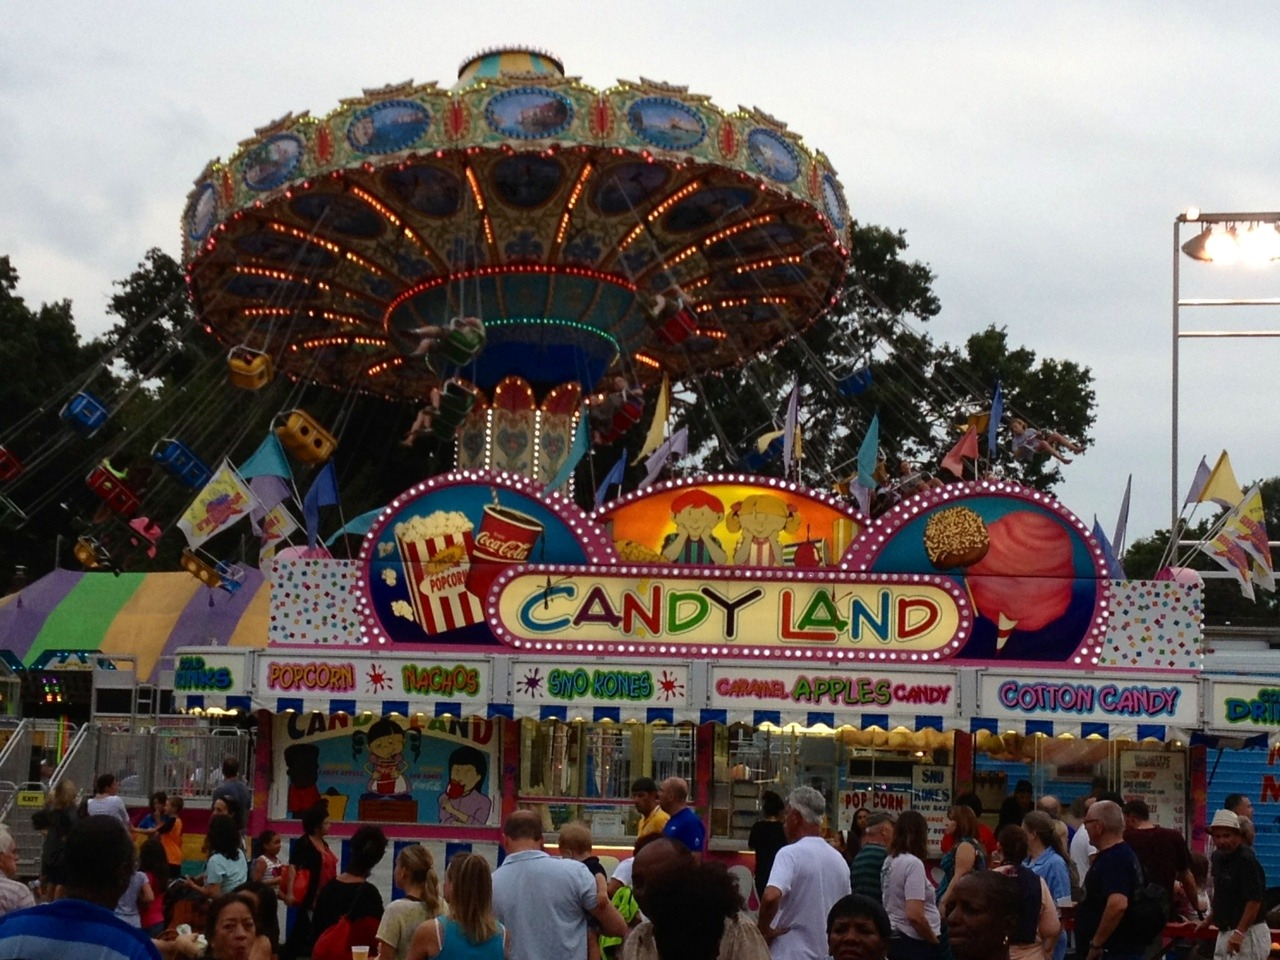 67bcdecadb10e50a6415_Candyland.jpg